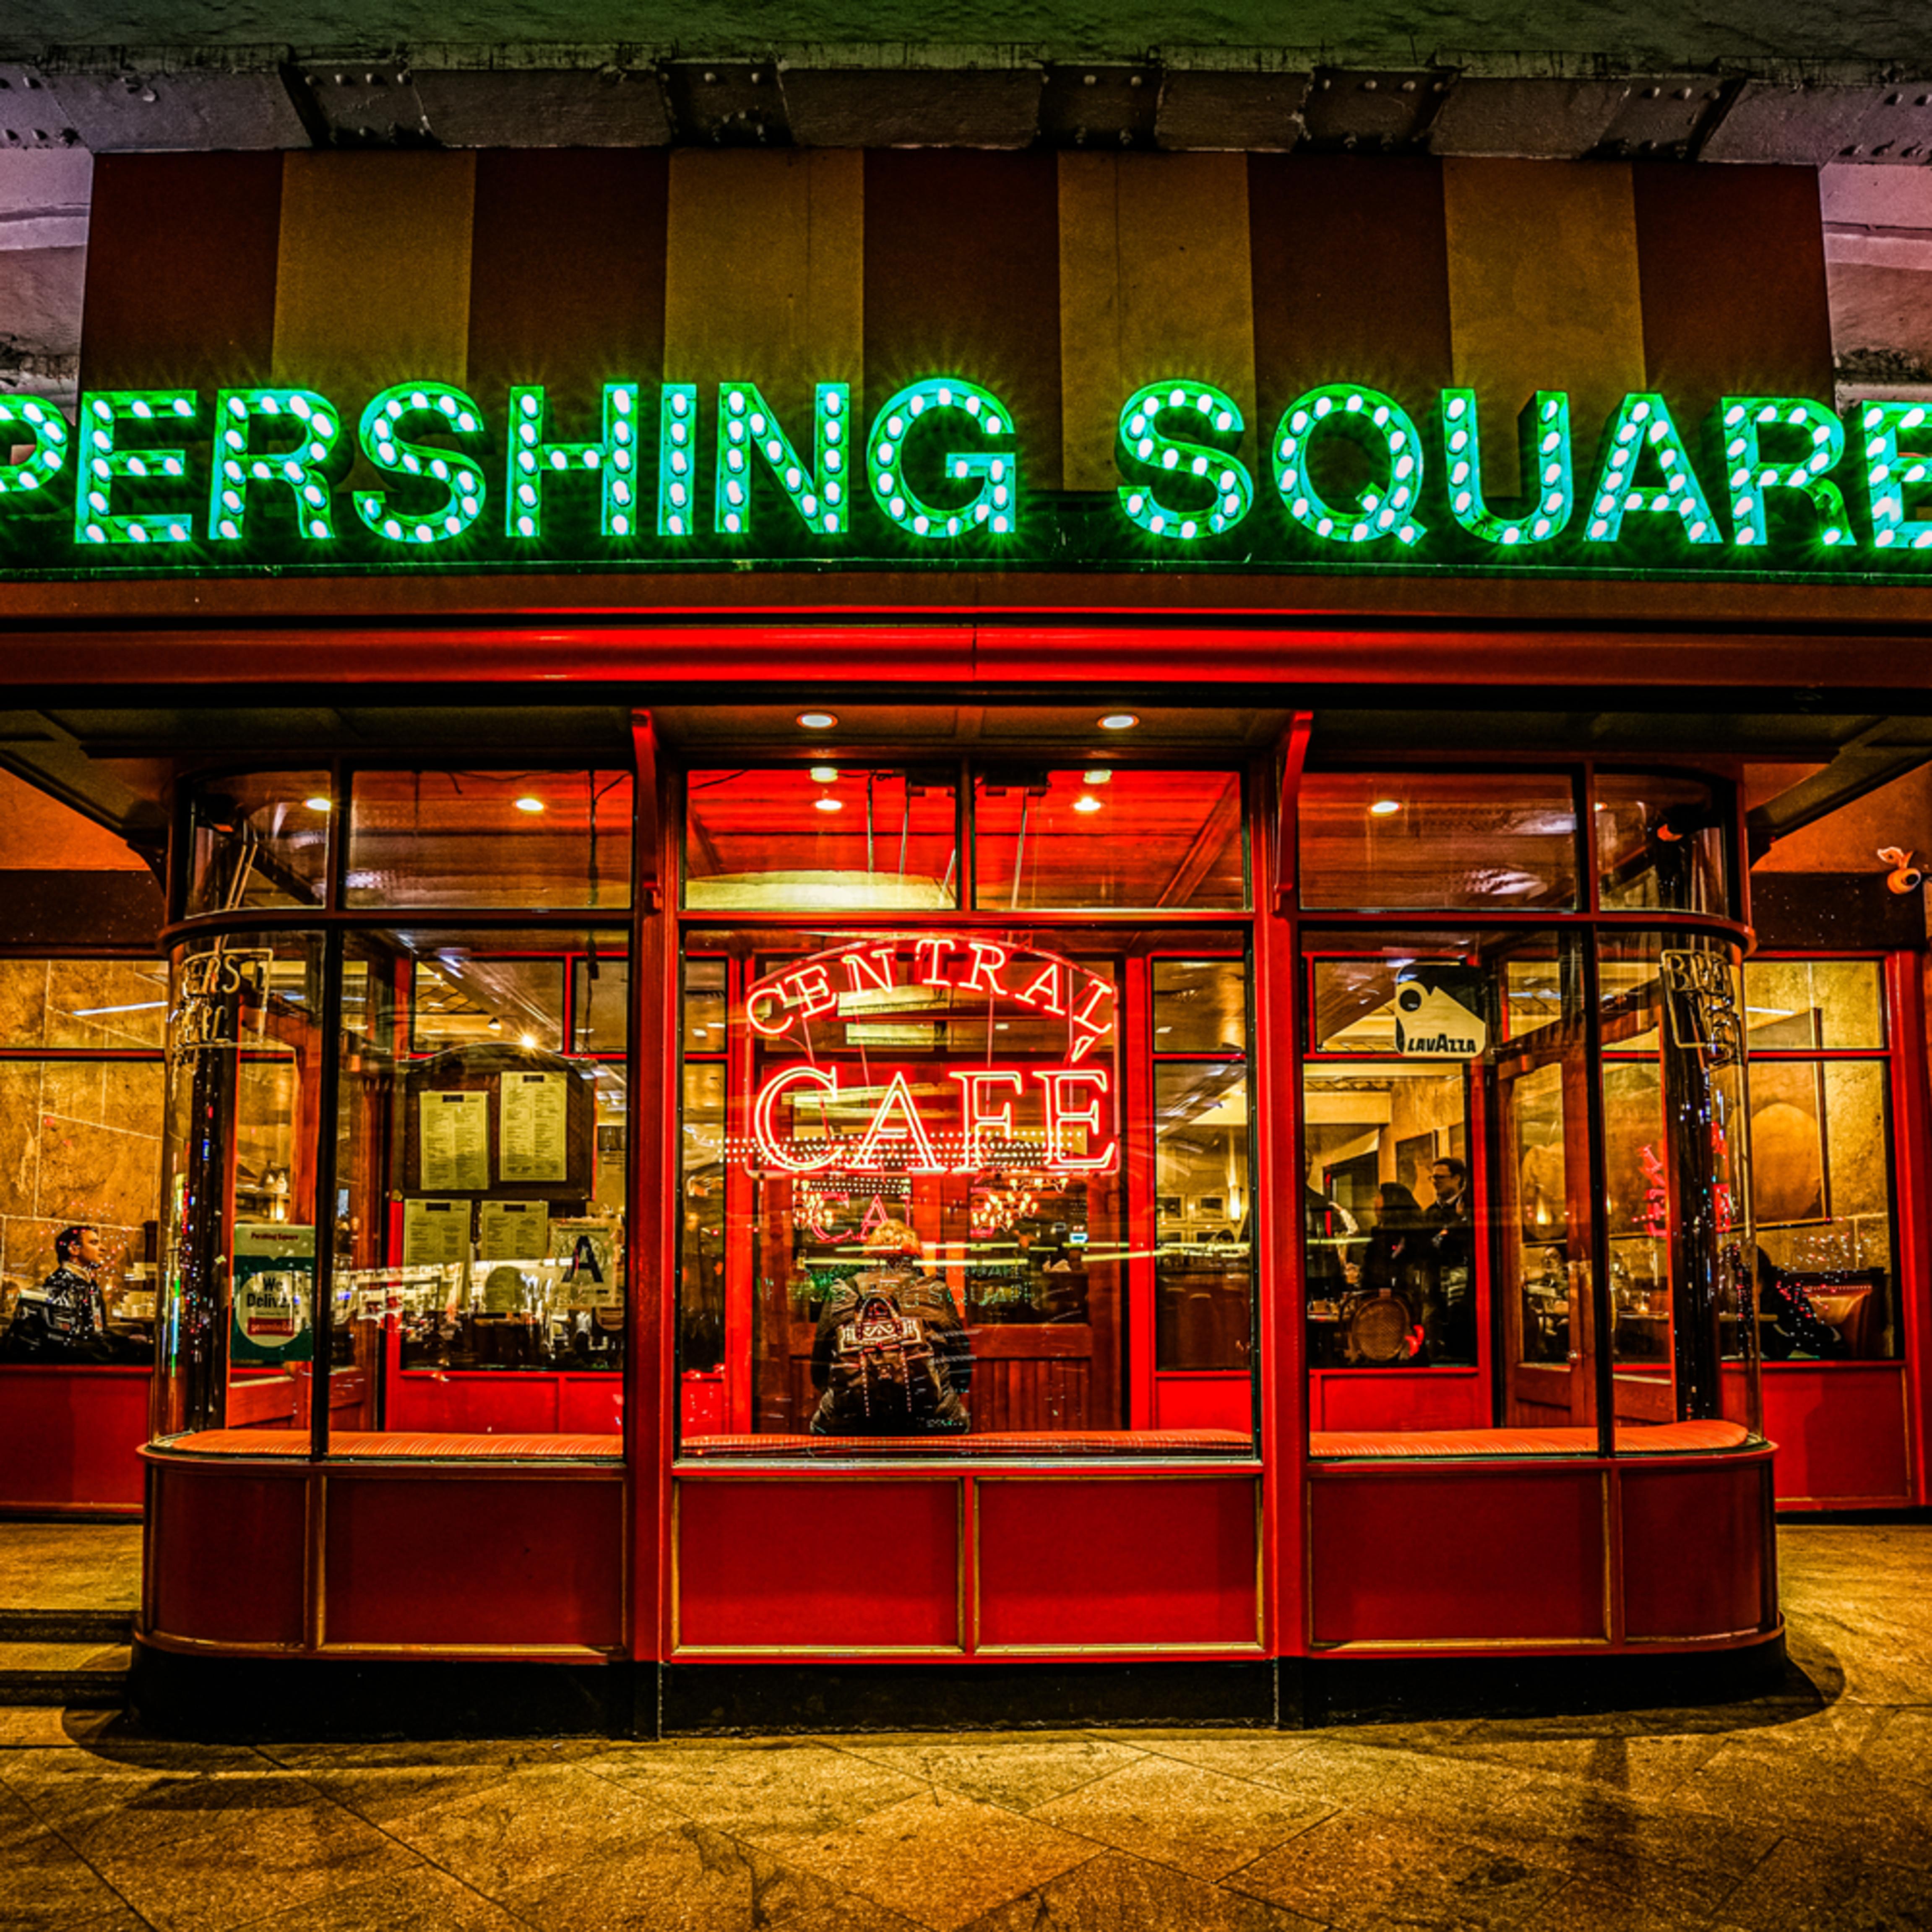 Pershing square dhcy9b